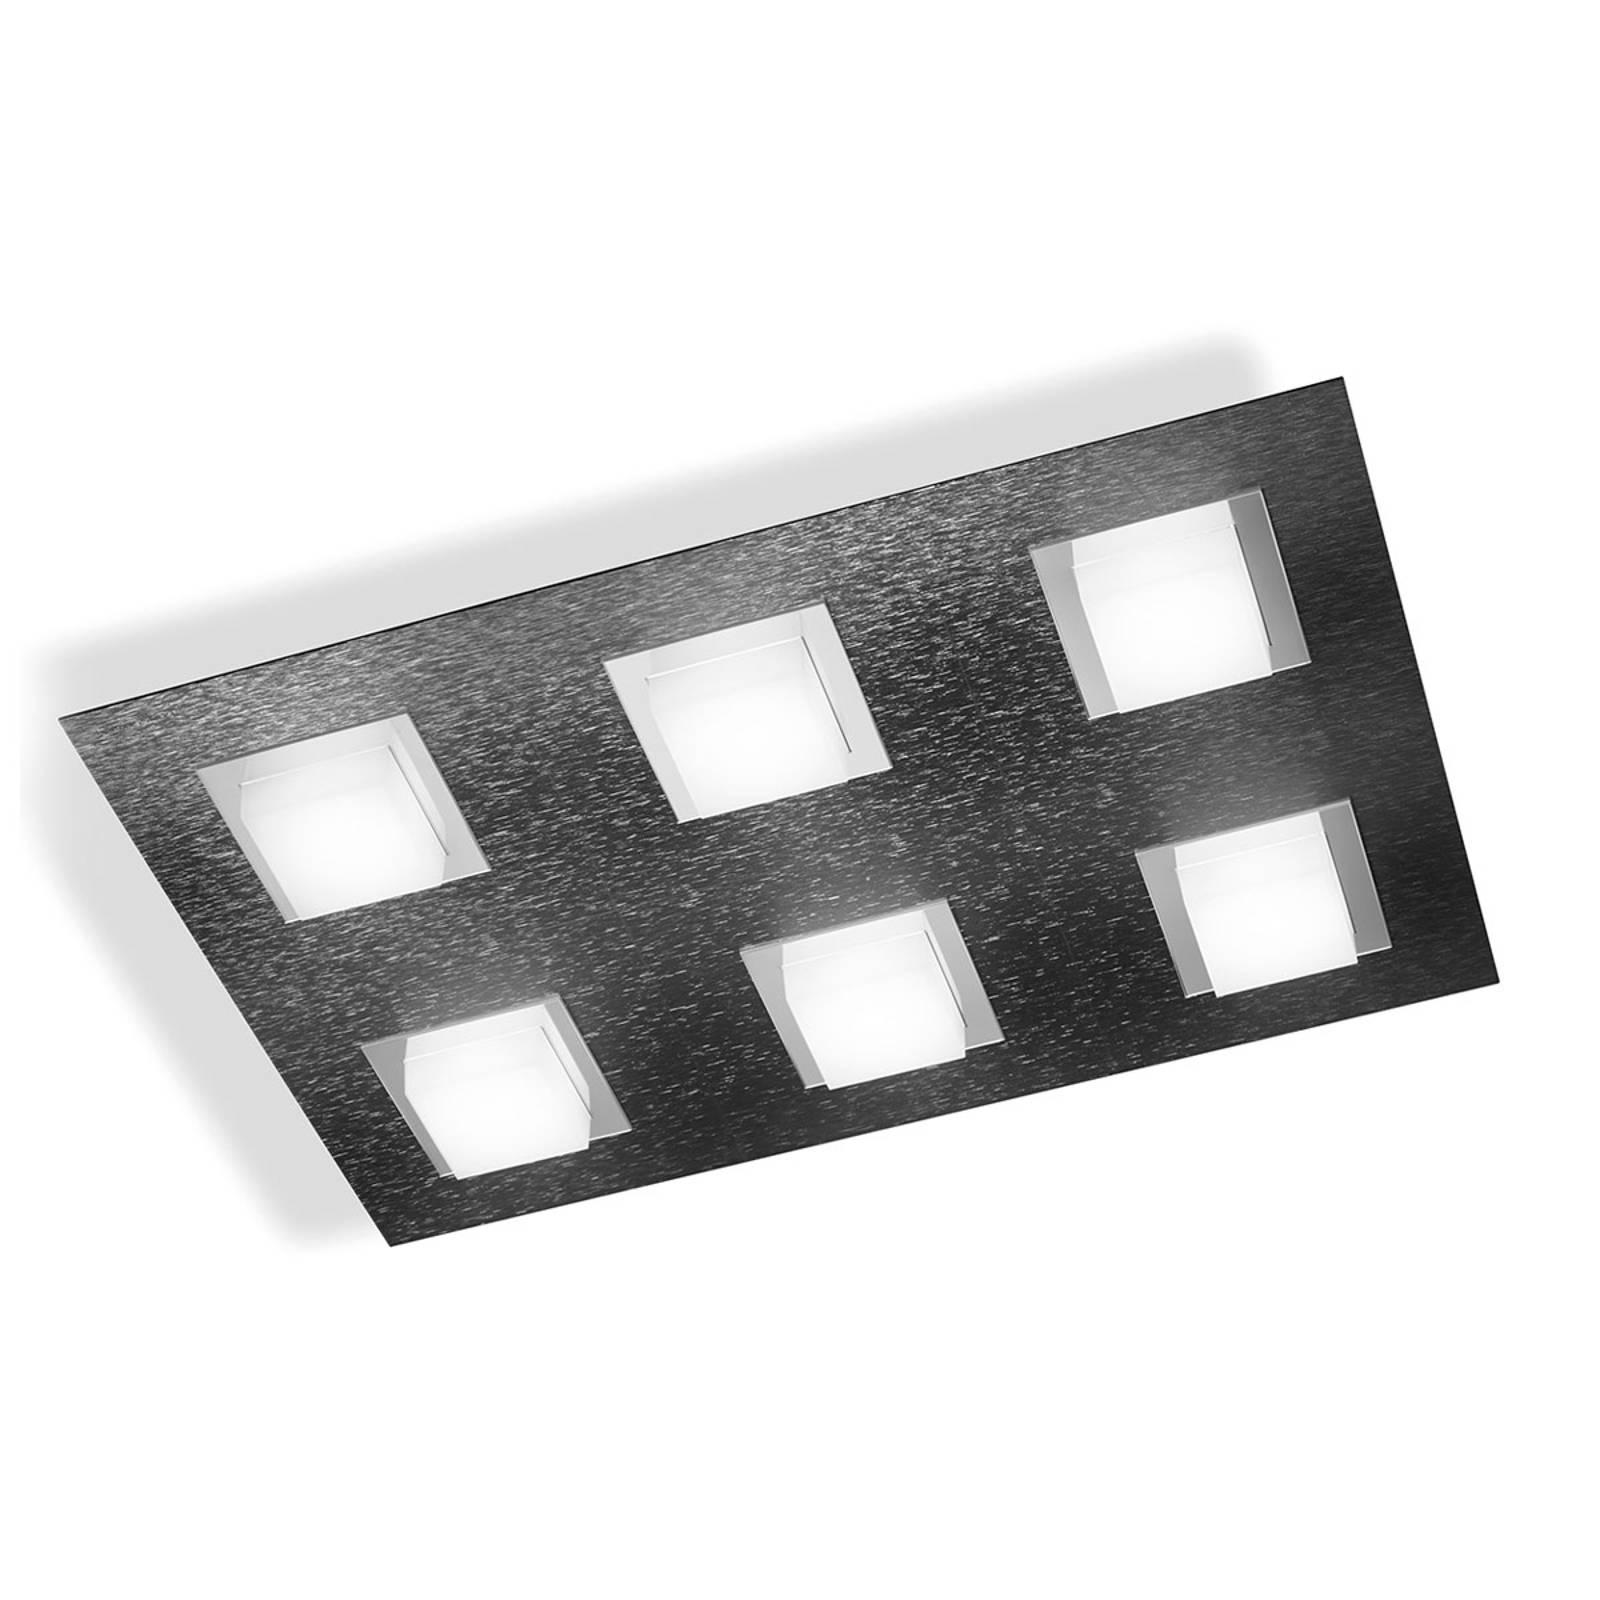 GROSSMANN Basic LED-valaisin 6-lampp., antrasiitti